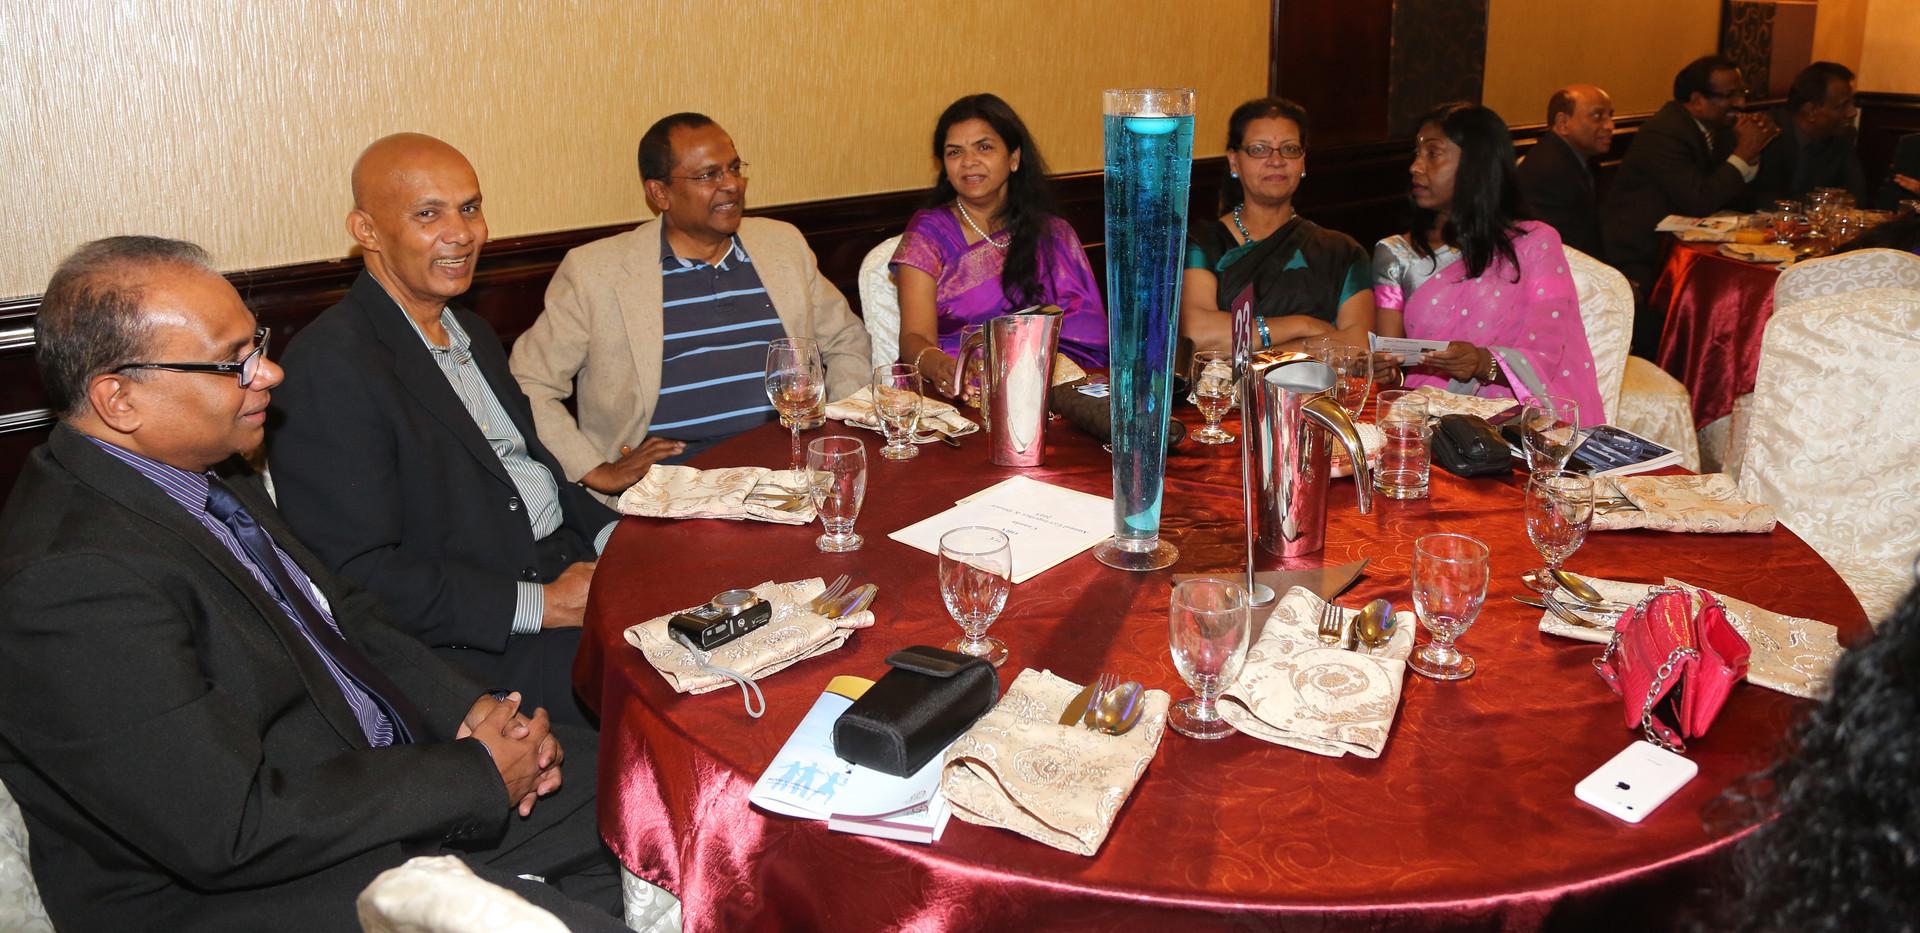 jccoba dinner photos Sriranjan 2015-020.JPG.jpg